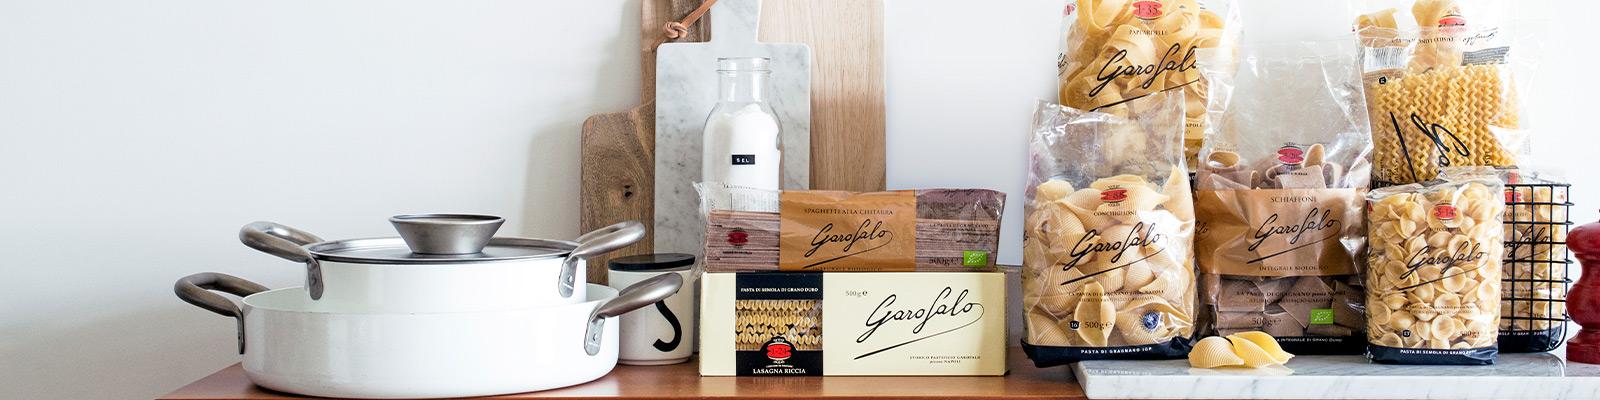 Pasta Garofalo - Produkter